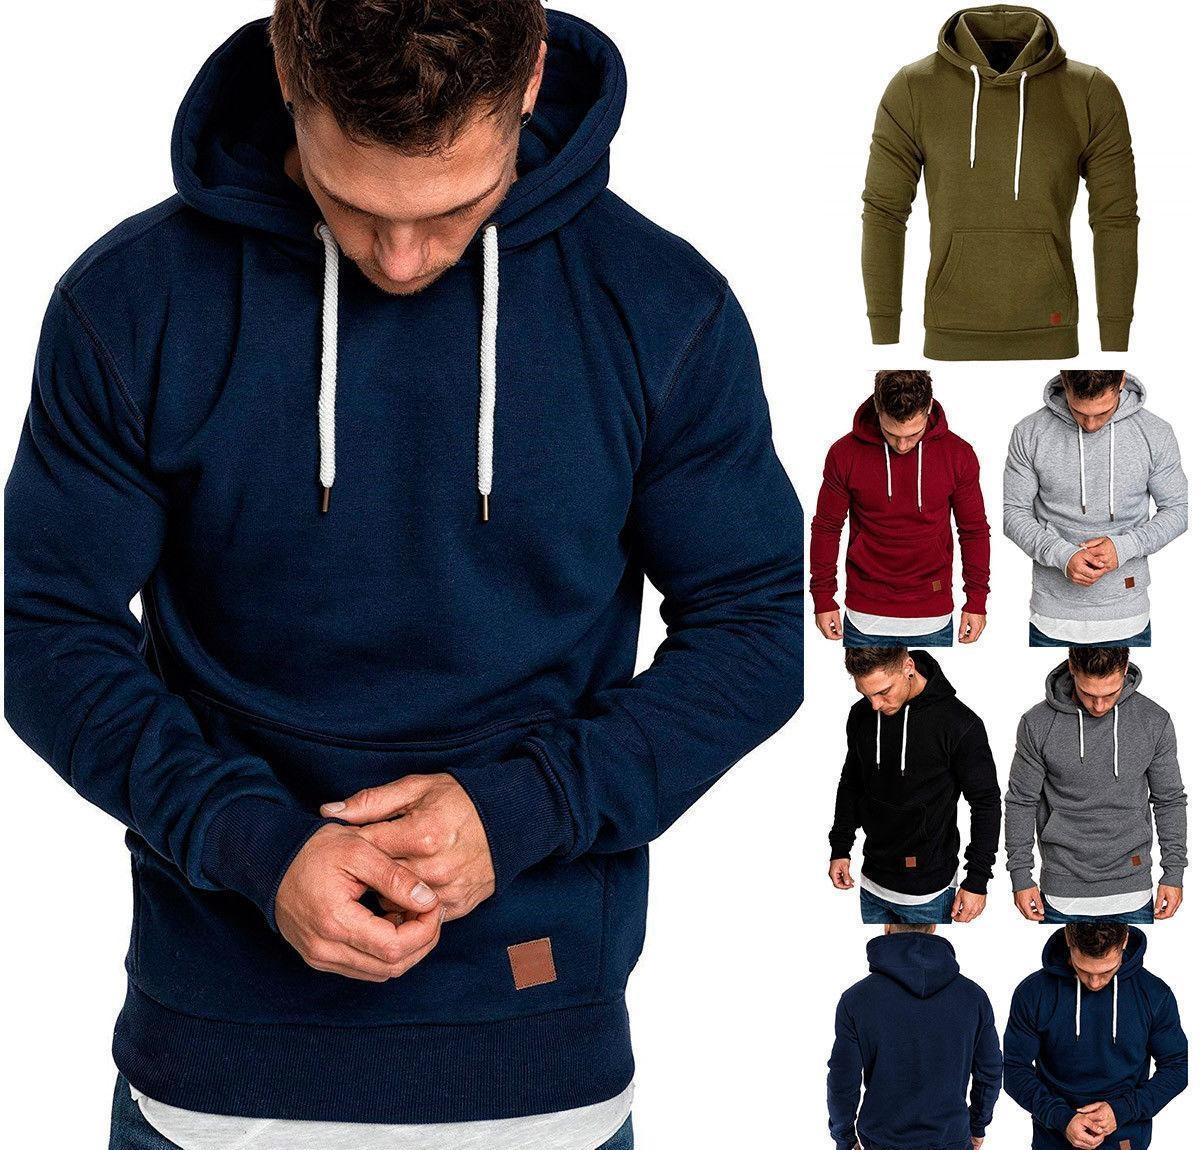 ZOMUSA Women Warm Casual Zip up Coat Hooded Cardigan Outwear Jacket Long Sweatshirt S-5XL